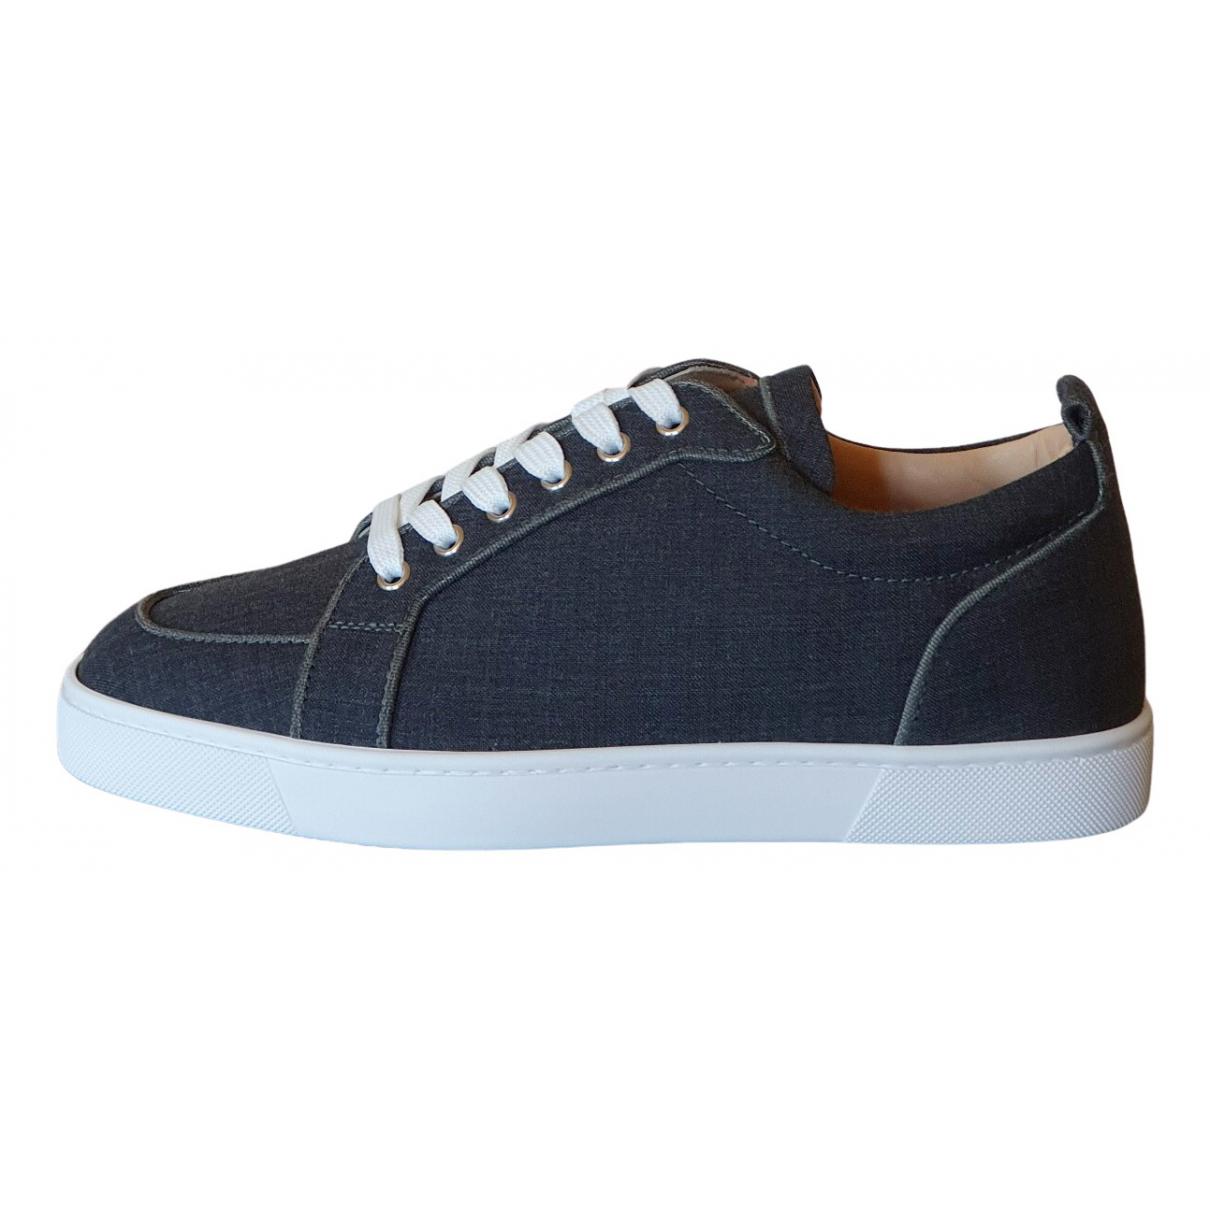 Christian Louboutin \N Sneakers in  Blau Leinen